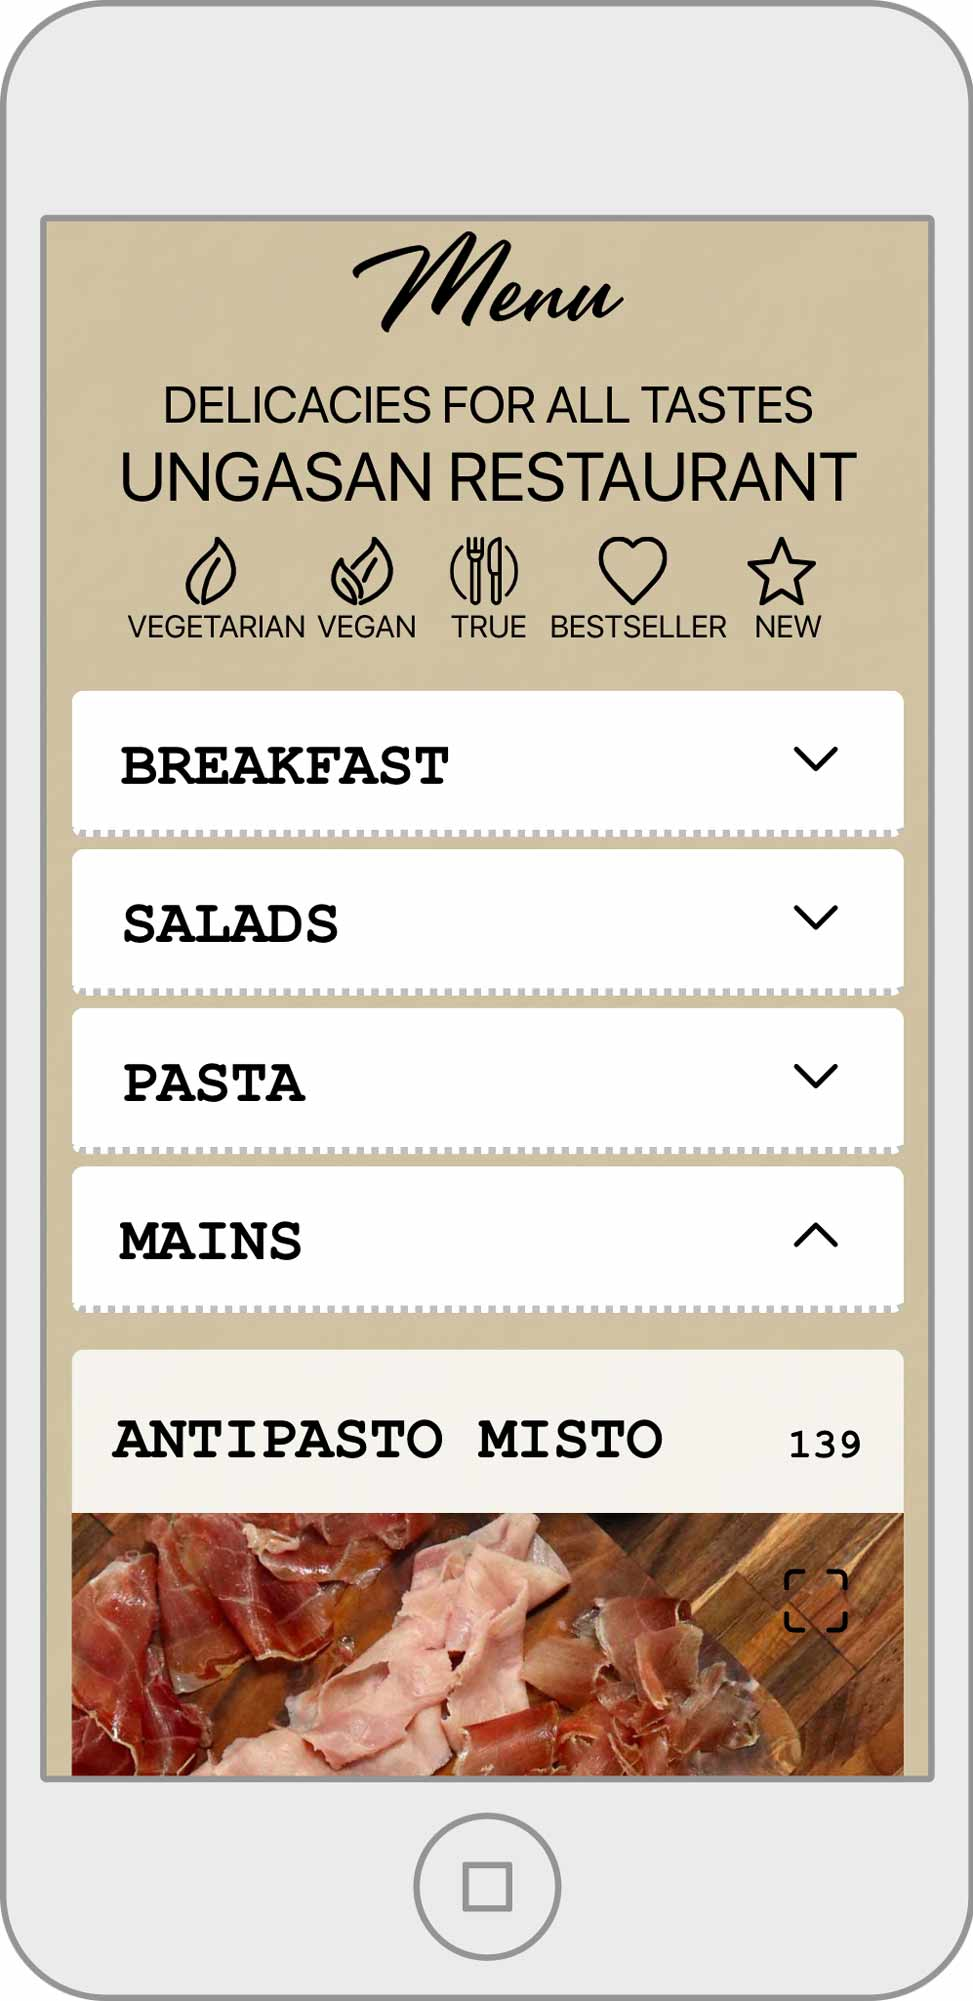 Casa Asia Ungasan Restaurant visual menu